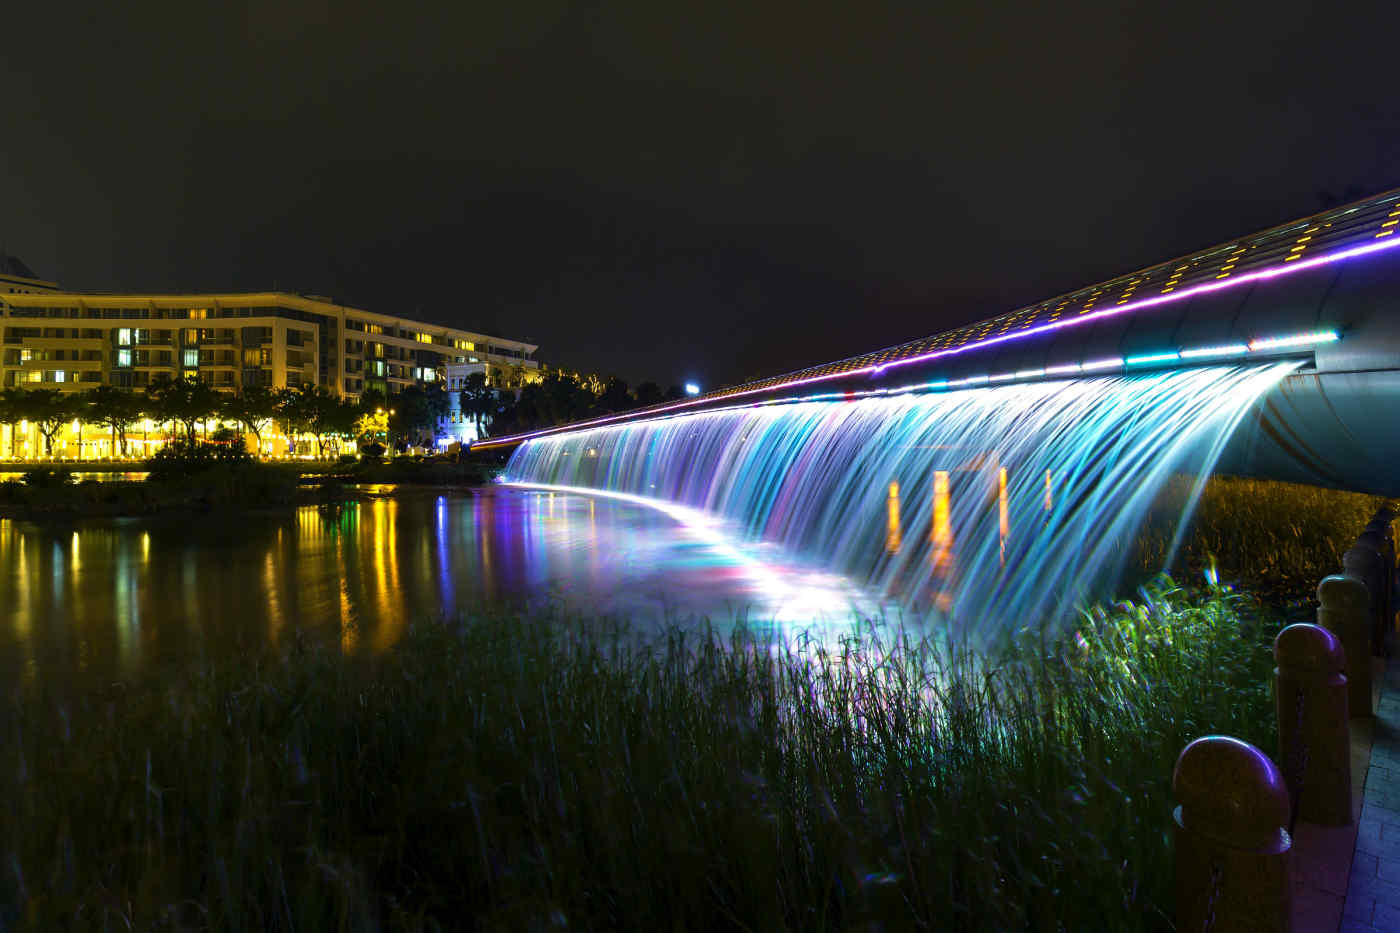 Starlight Bridge in Saigon, Vietnam